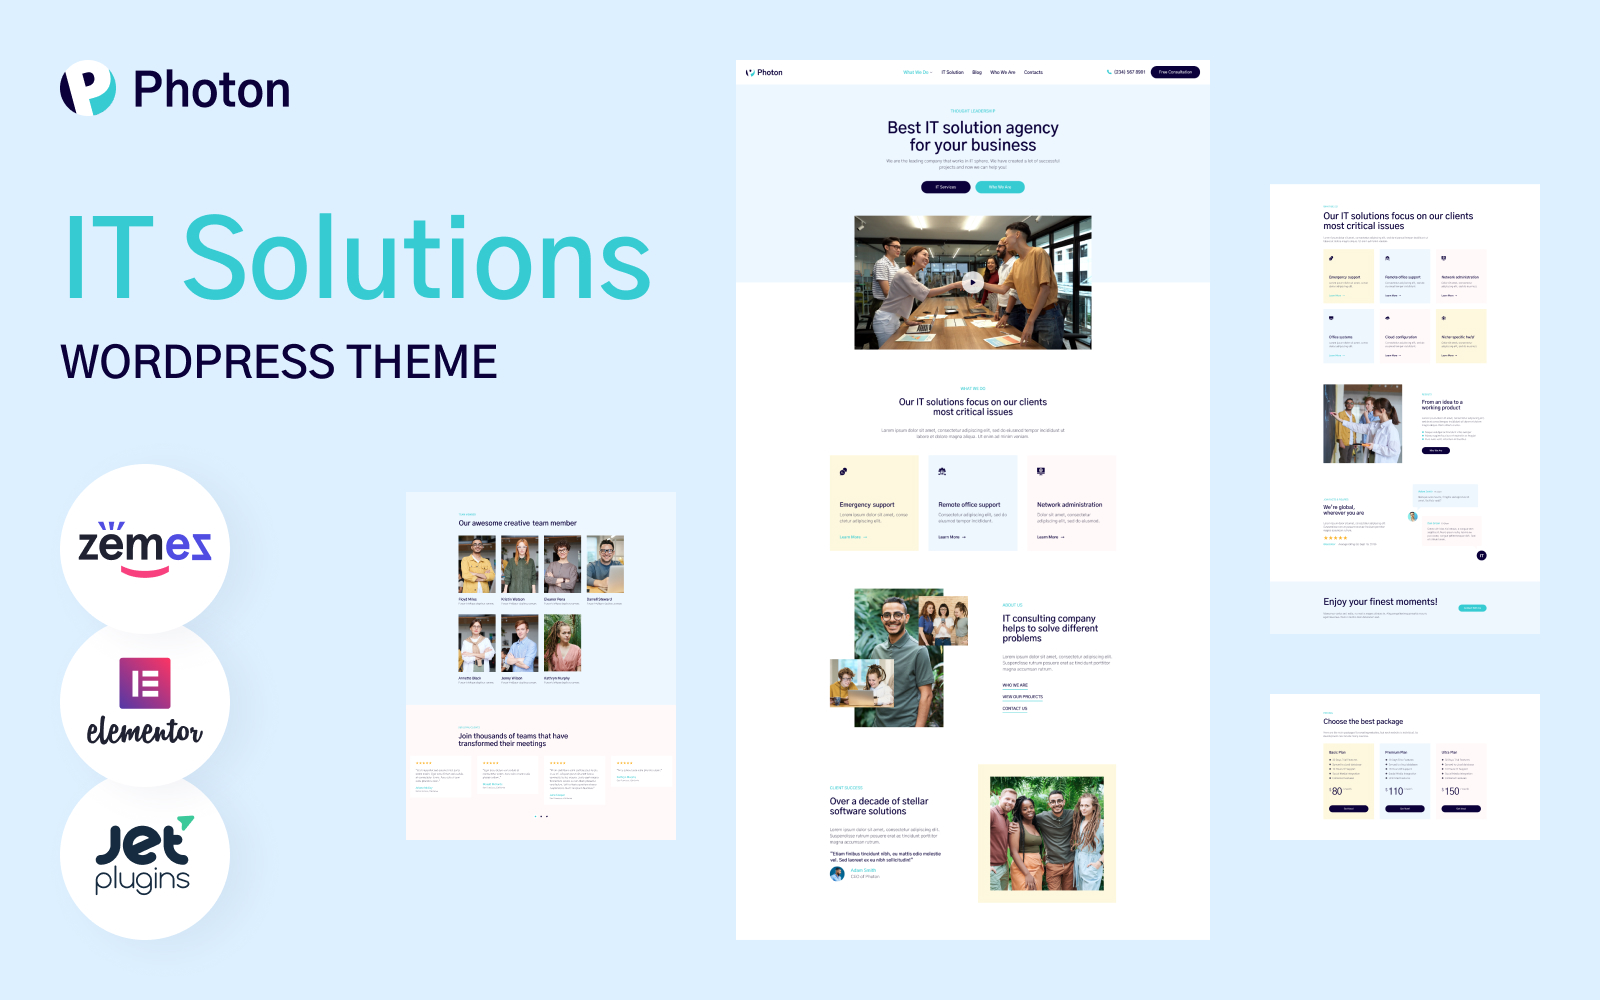 Photon - IT Solutions WordPress Theme